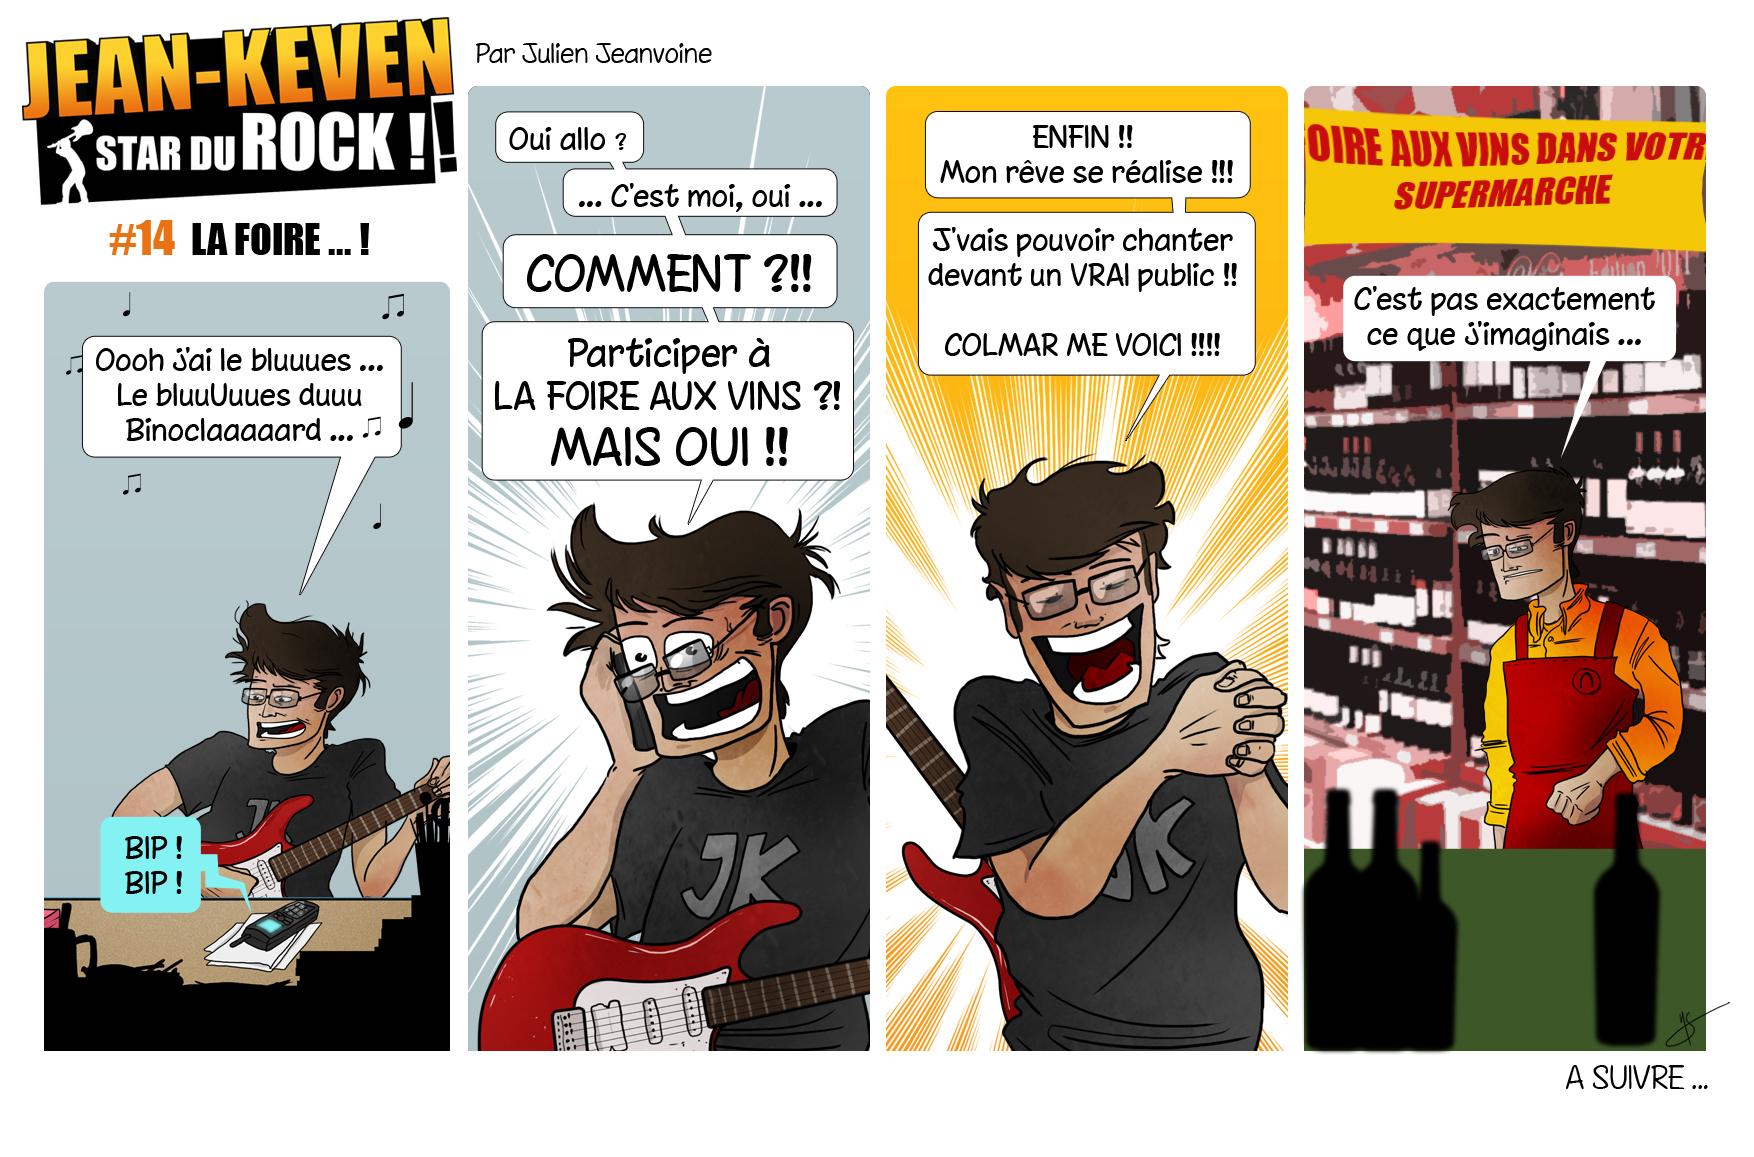 http://jeanvoine.julien.free.fr/stricades%207/JKPLANCHE014.jpg